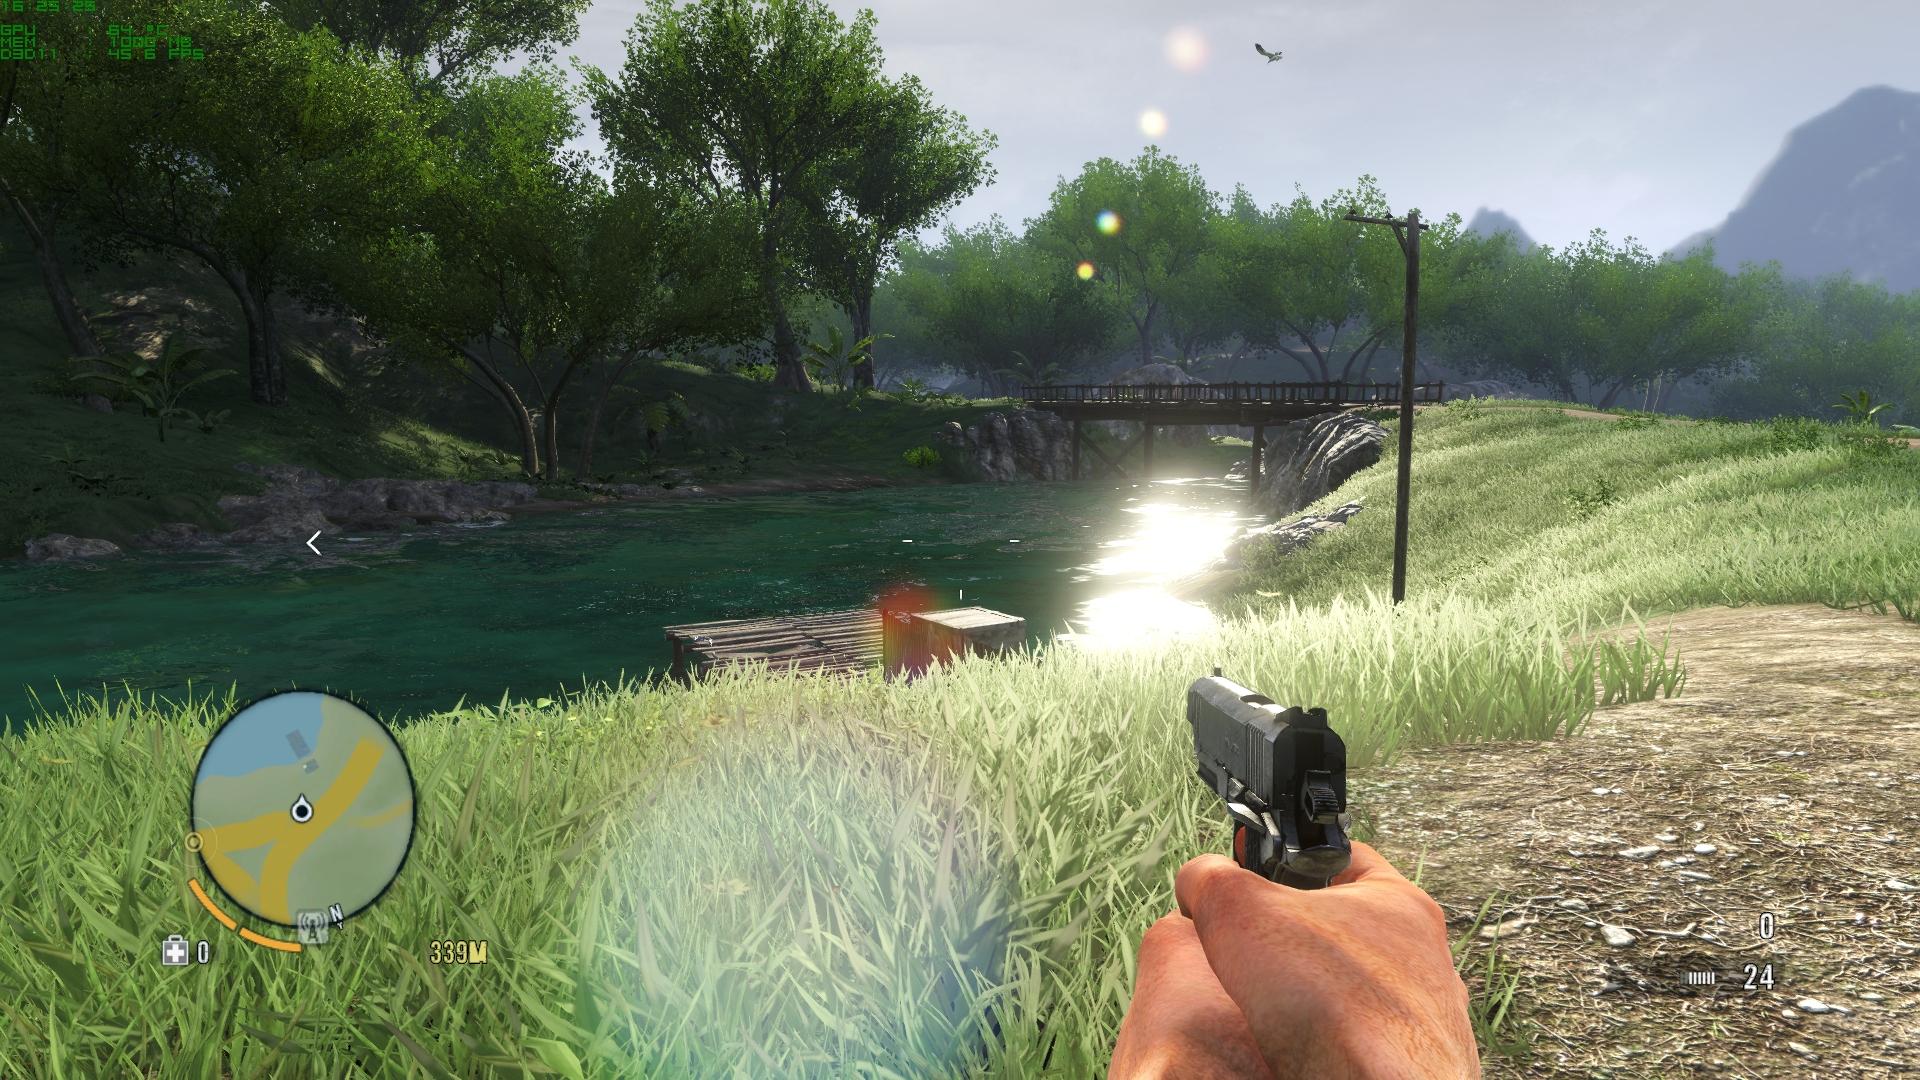 Far cry 4. Графика. Руководство по настройкам. Тестирование.